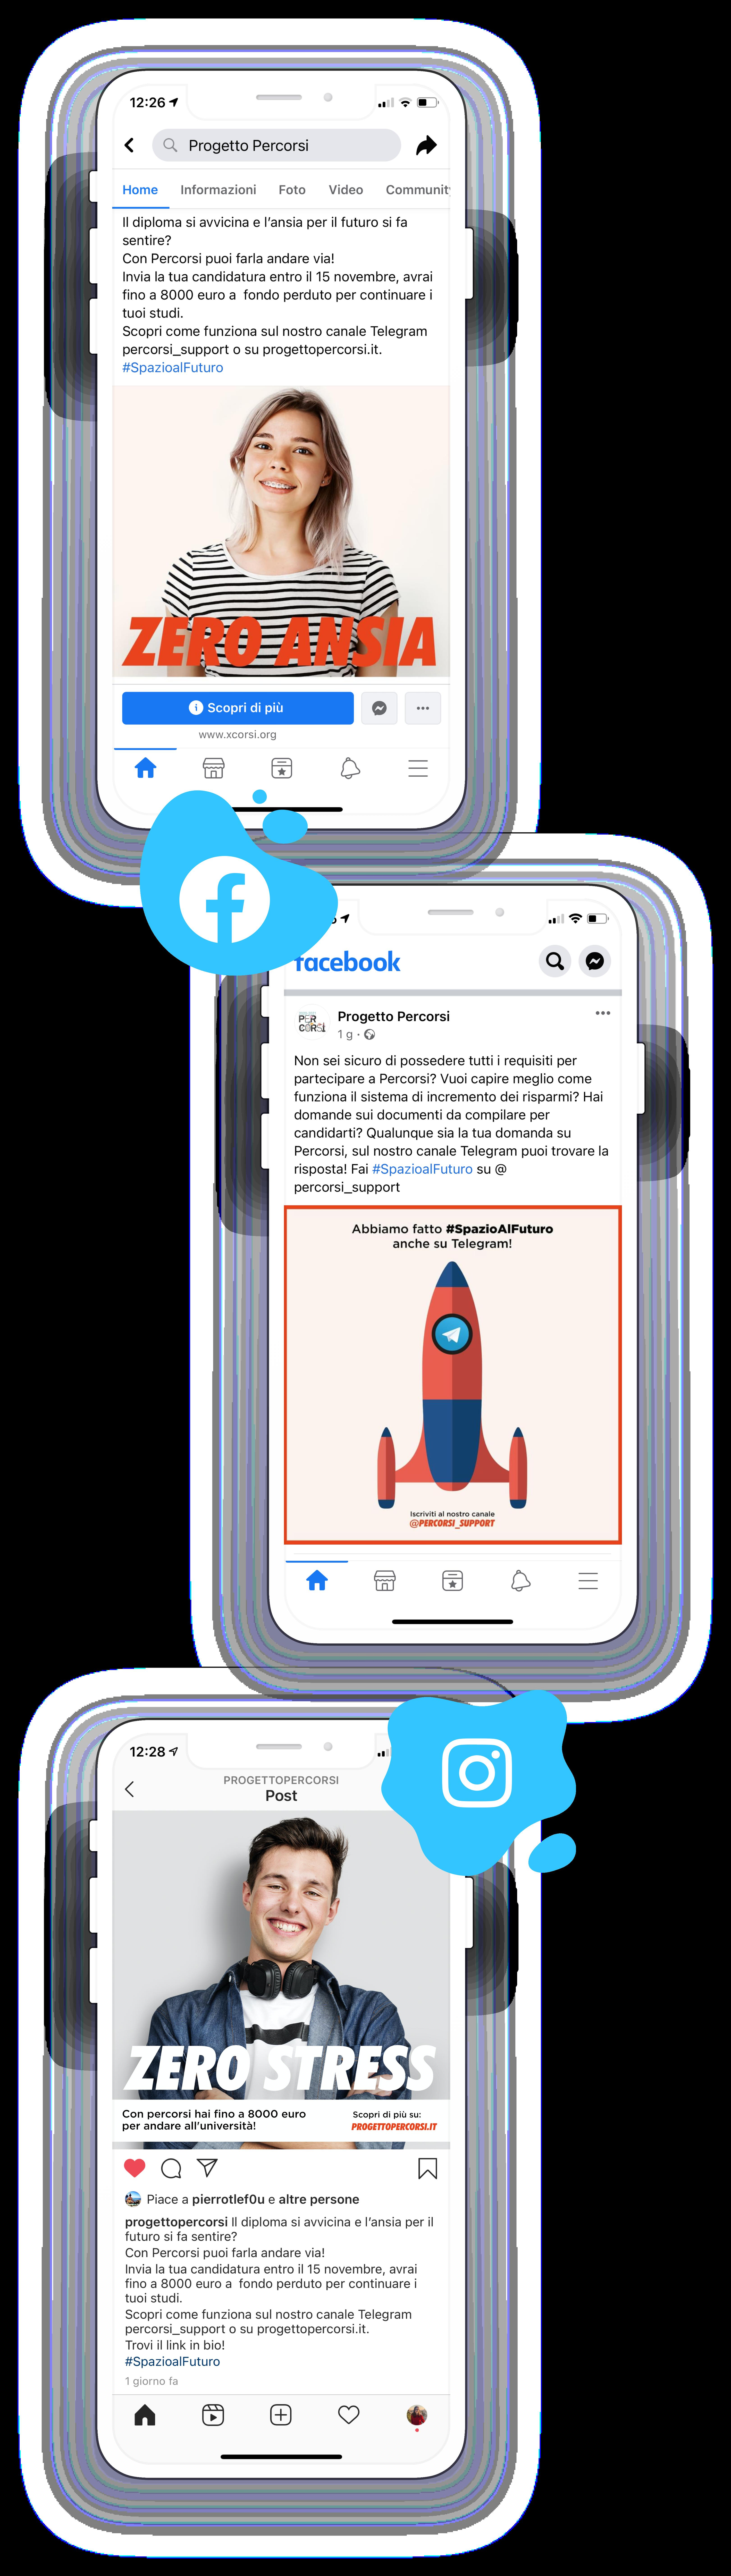 iphone mockup social card progetto percorsi